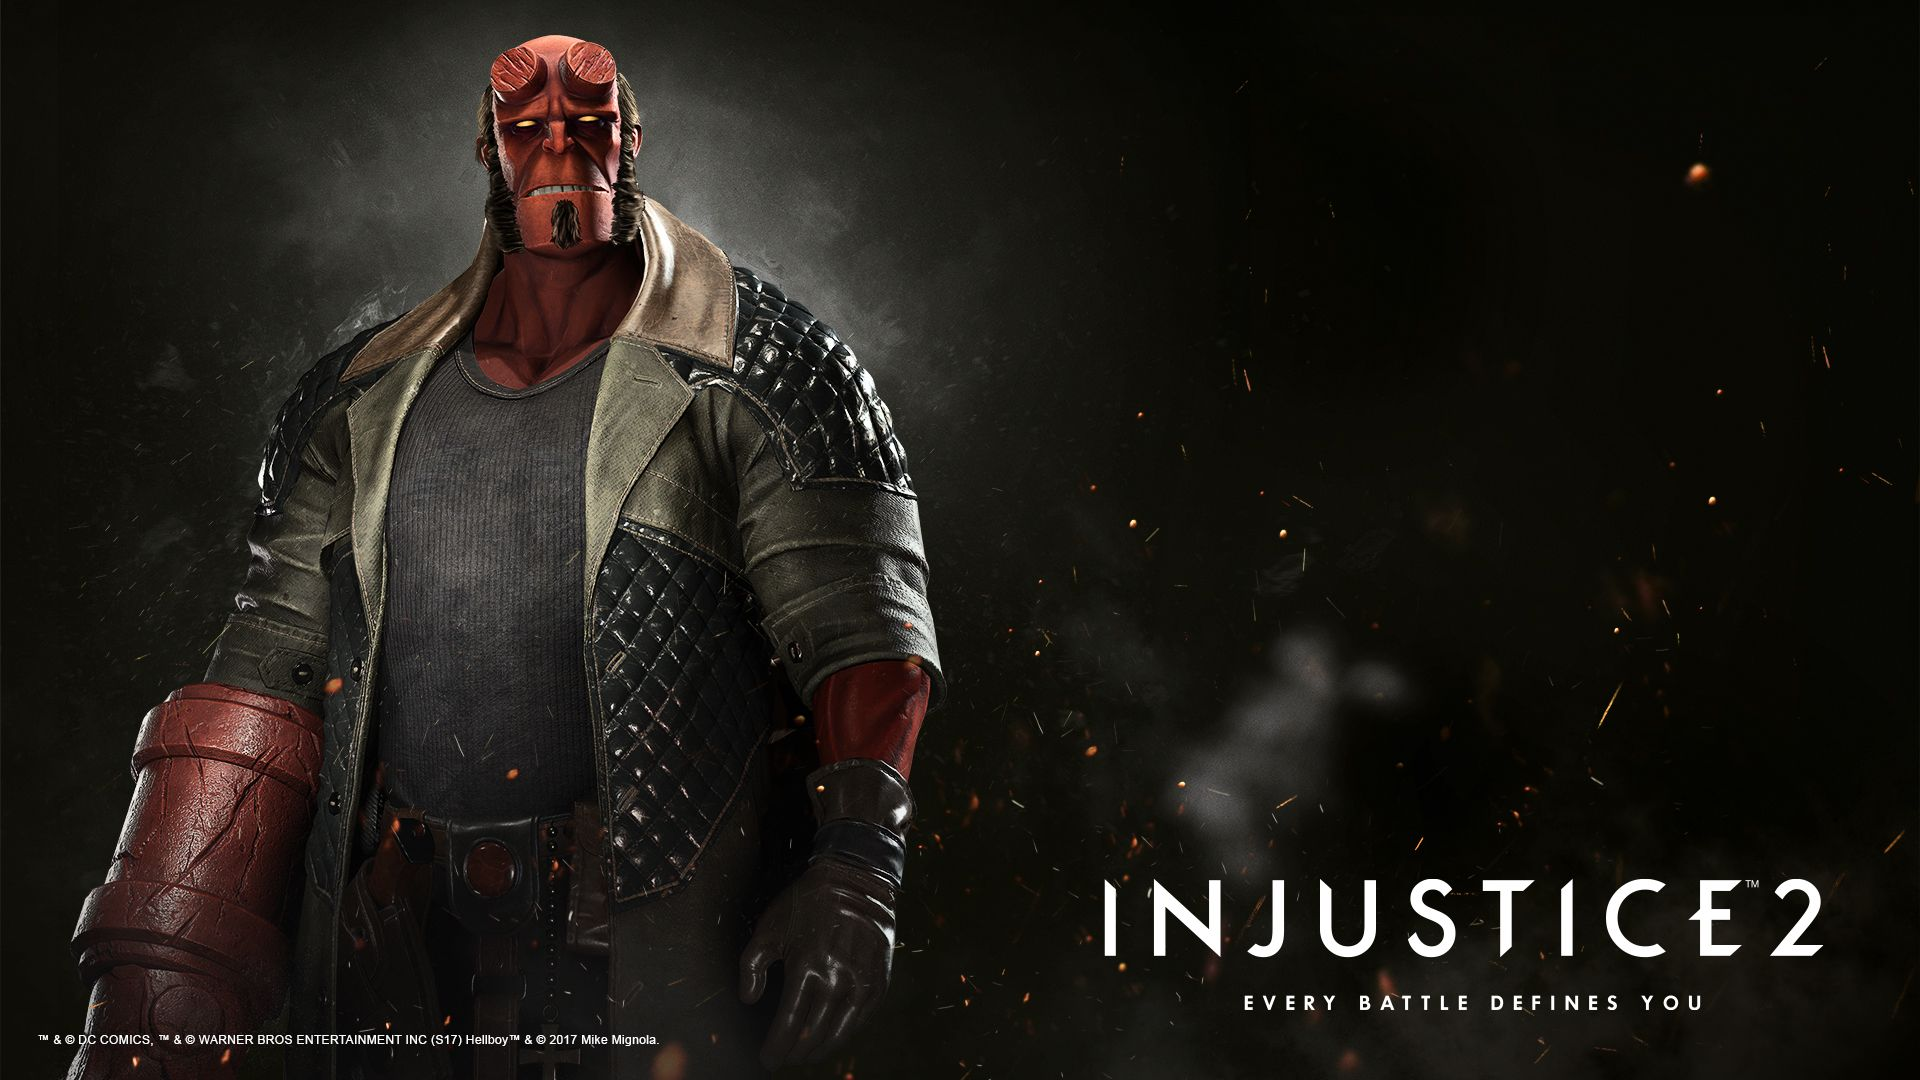 Image Injustice2 Hellboy Wallpaper 1920x1080 96 Jpg Injustice